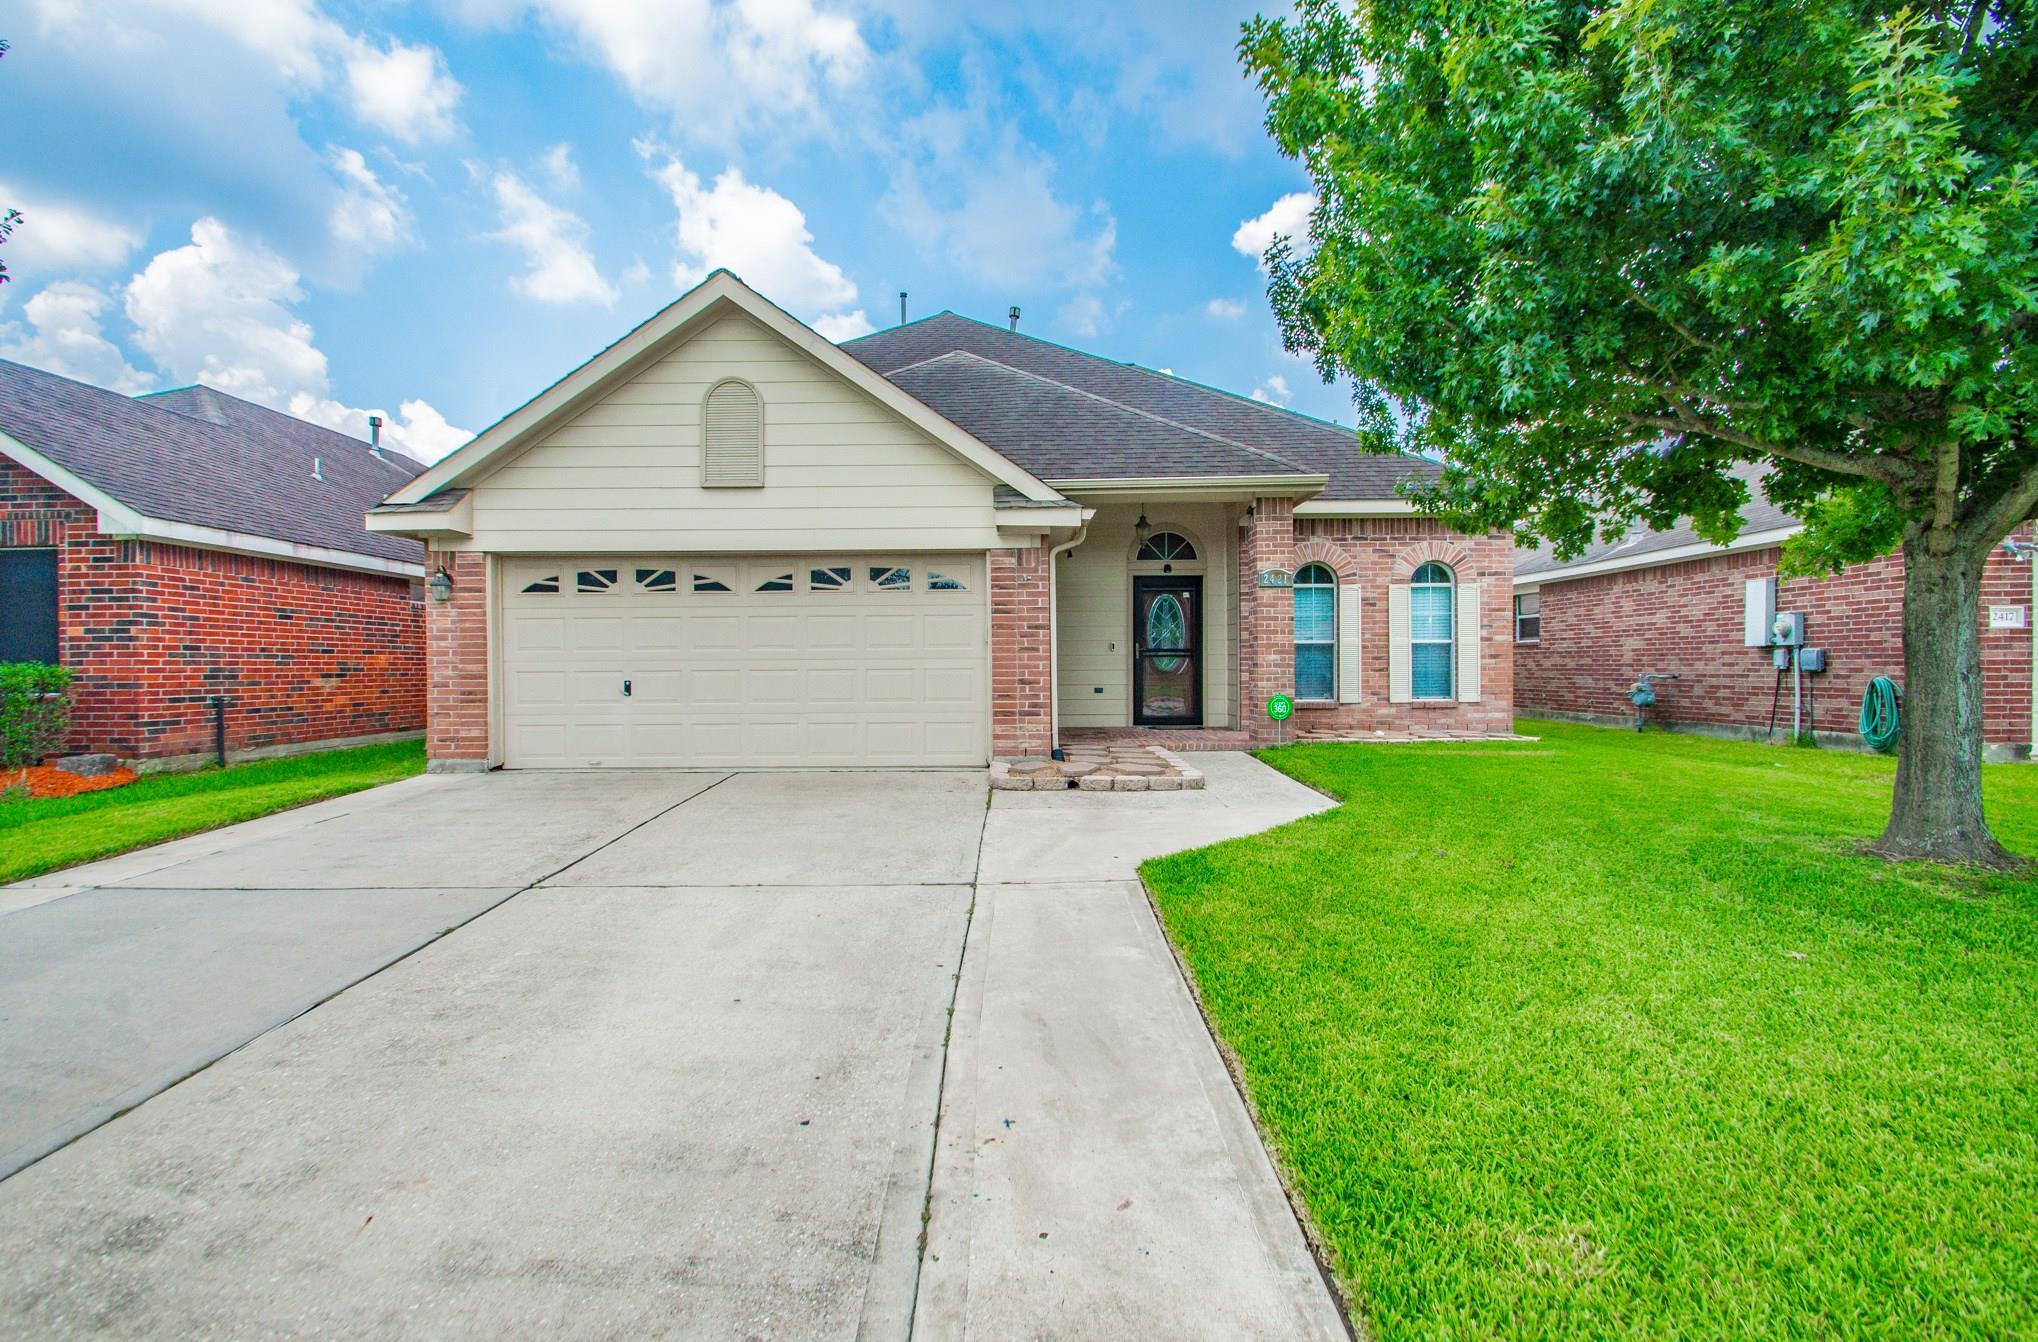 2421 Horseshoe Bend Property Photo - Deer Park, TX real estate listing